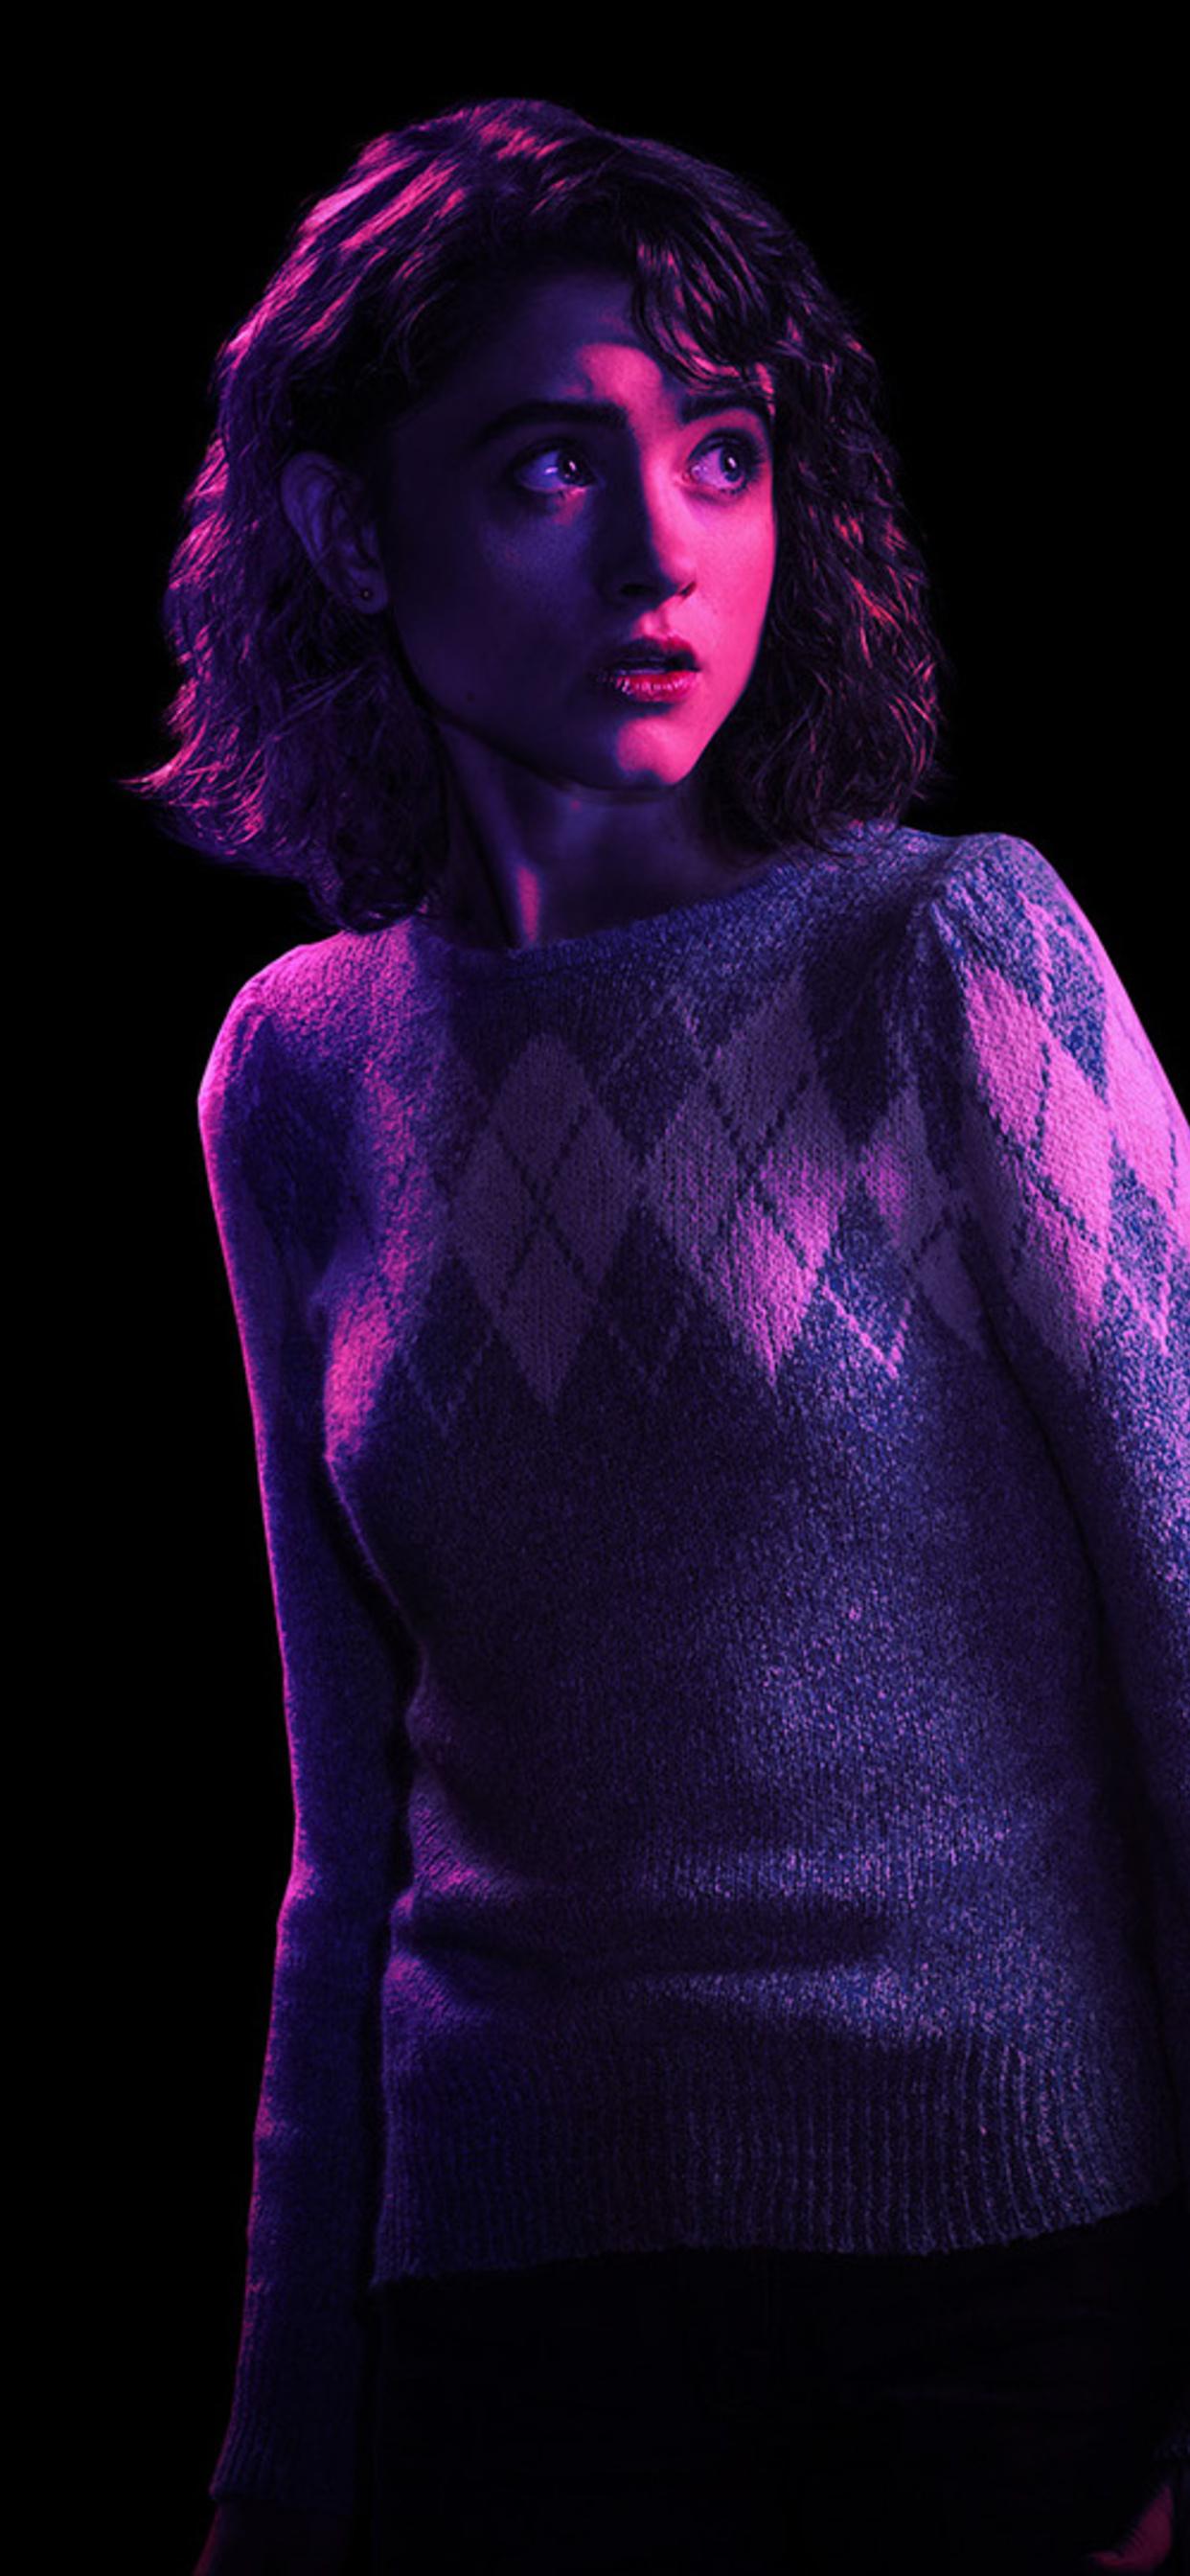 natalia-dyer-as-nancy-stranger-things-season-2-fd.jpg